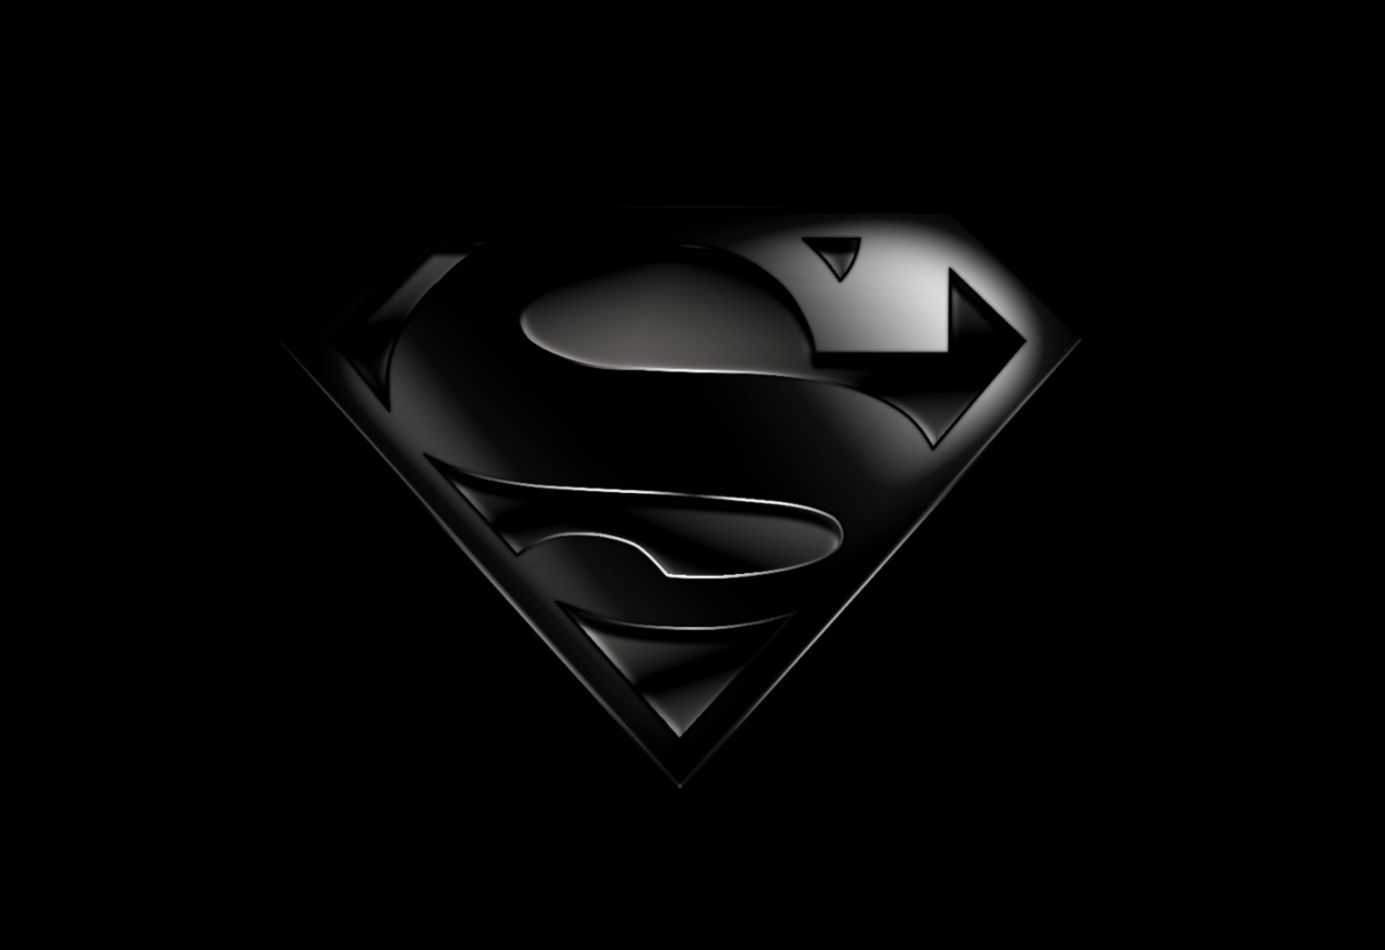 Superman Logo Wallpaper Black | Full HD Wallpapers